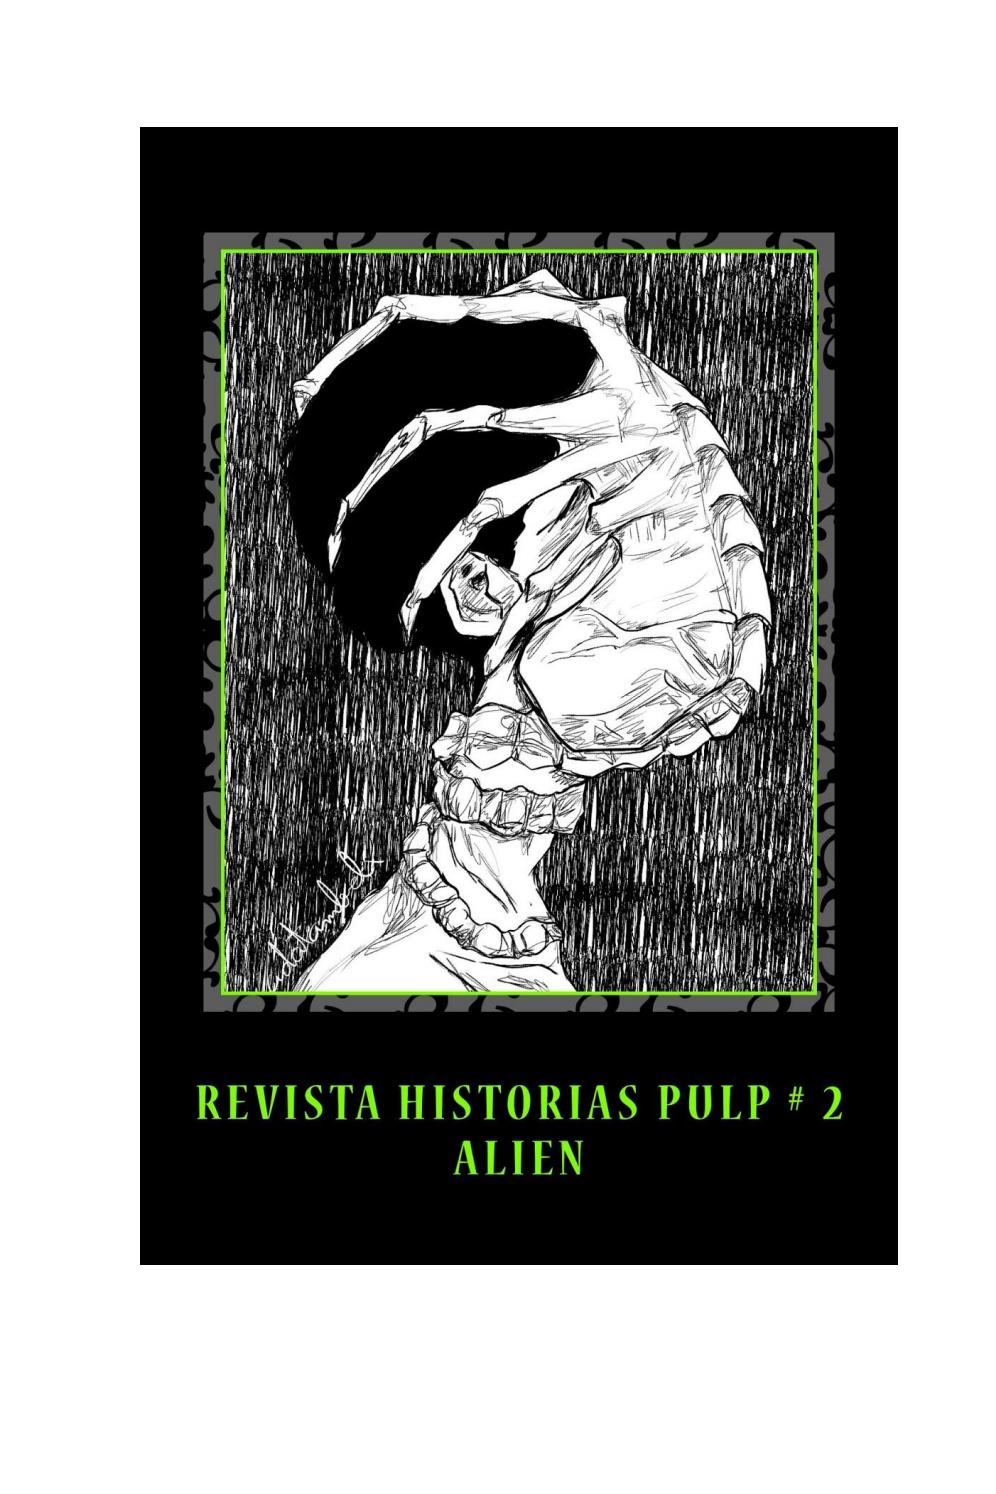 Animaciones Porno Una Alienigena revista historias pulp 2 alienisrael montalvo - issuu